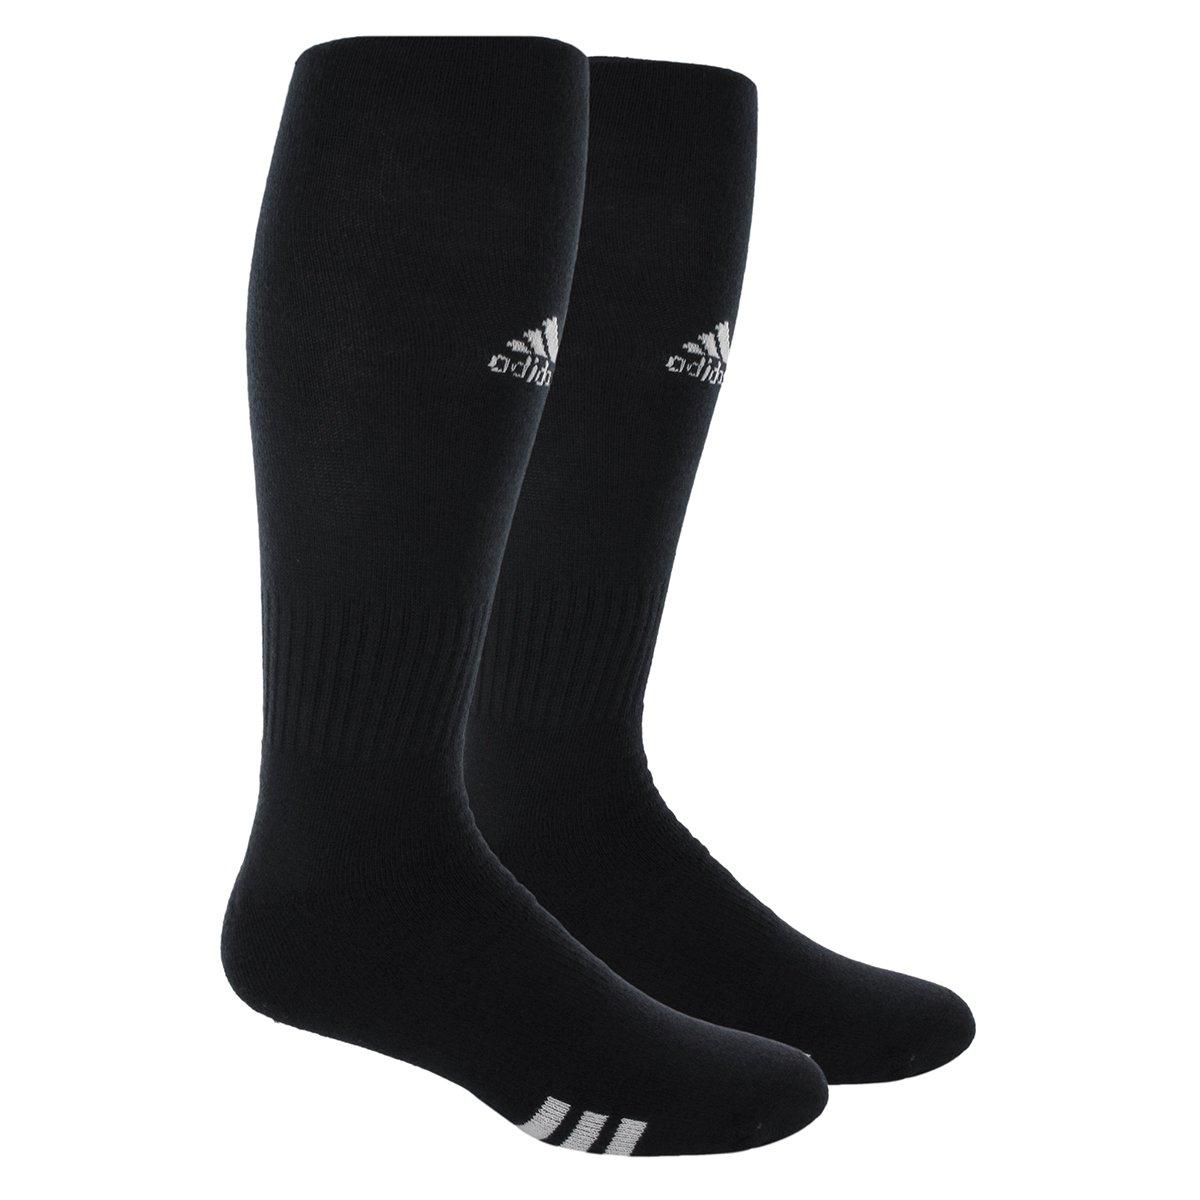 adidas Rivalry Field Multi-Sport Socks (2-Pack)